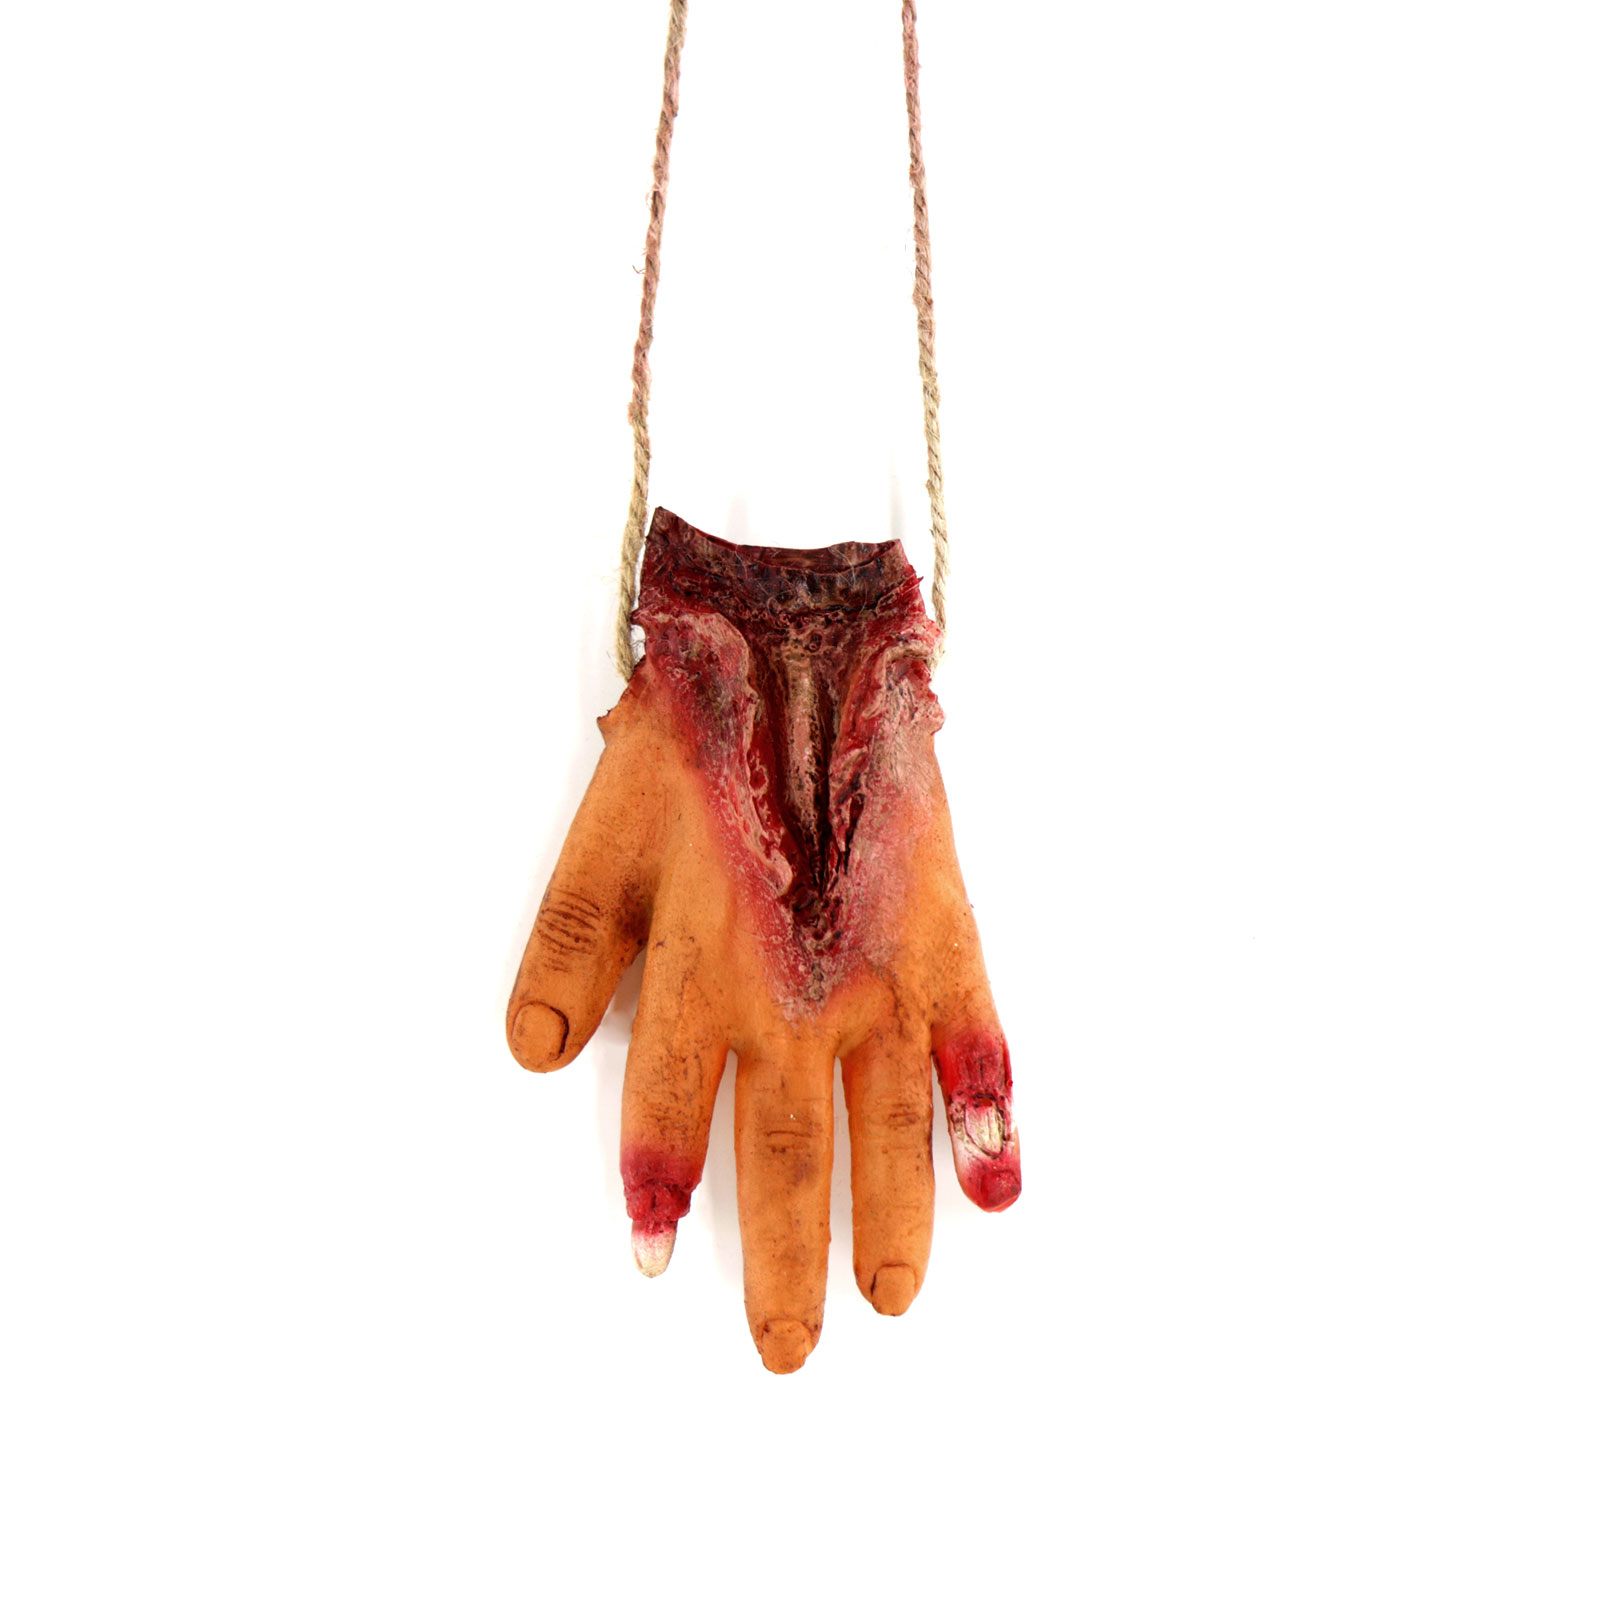 Image 4 - Halloween Decoration Props Horror Realistic Broken Hand Broken Chain Hanging Chain Props Eyeball Broken Hand Party Supplies-in Party DIY Decorations from Home & Garden